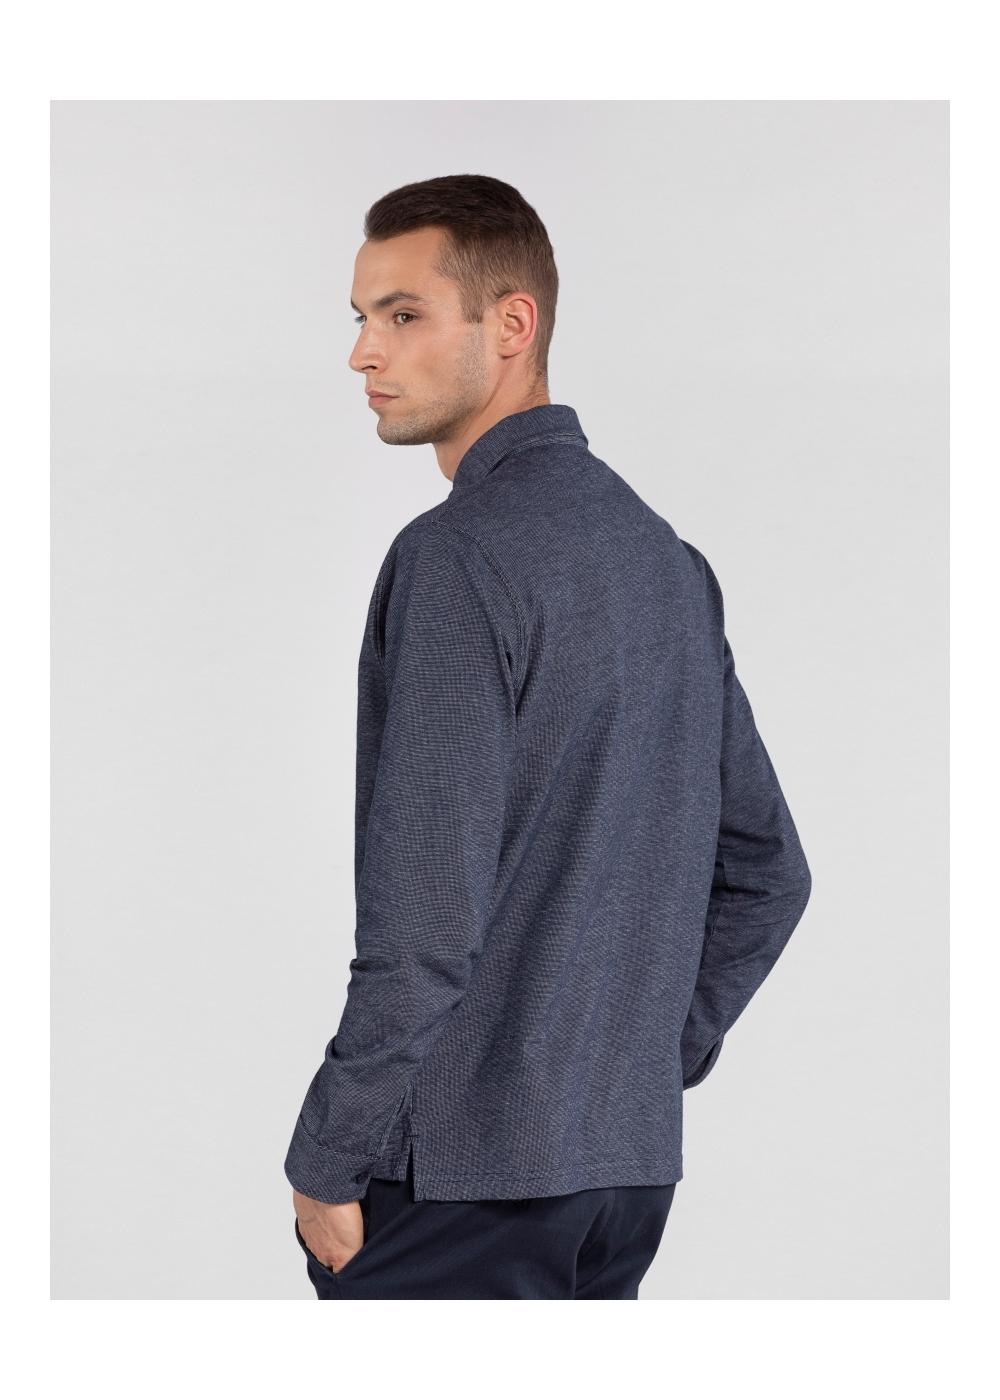 Koszula polo POLMT-0039-69(Z20)